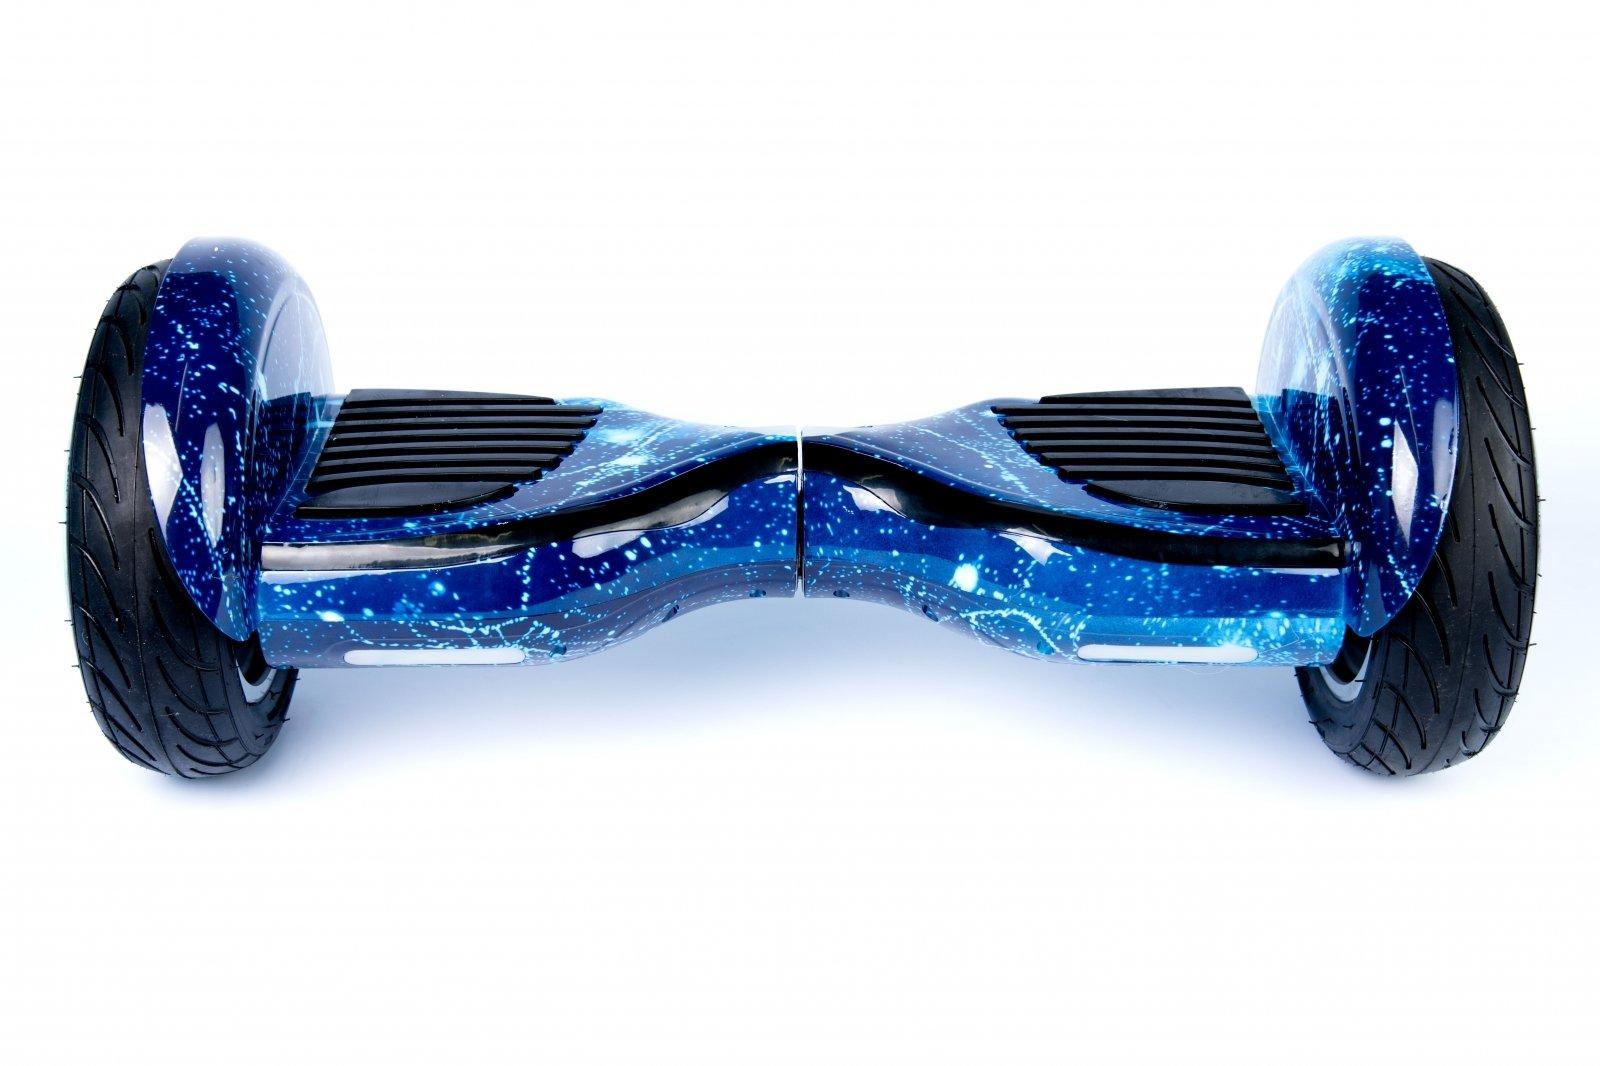 Гироскутер PRO PREMIUM 10.5 V2 Синий Космос